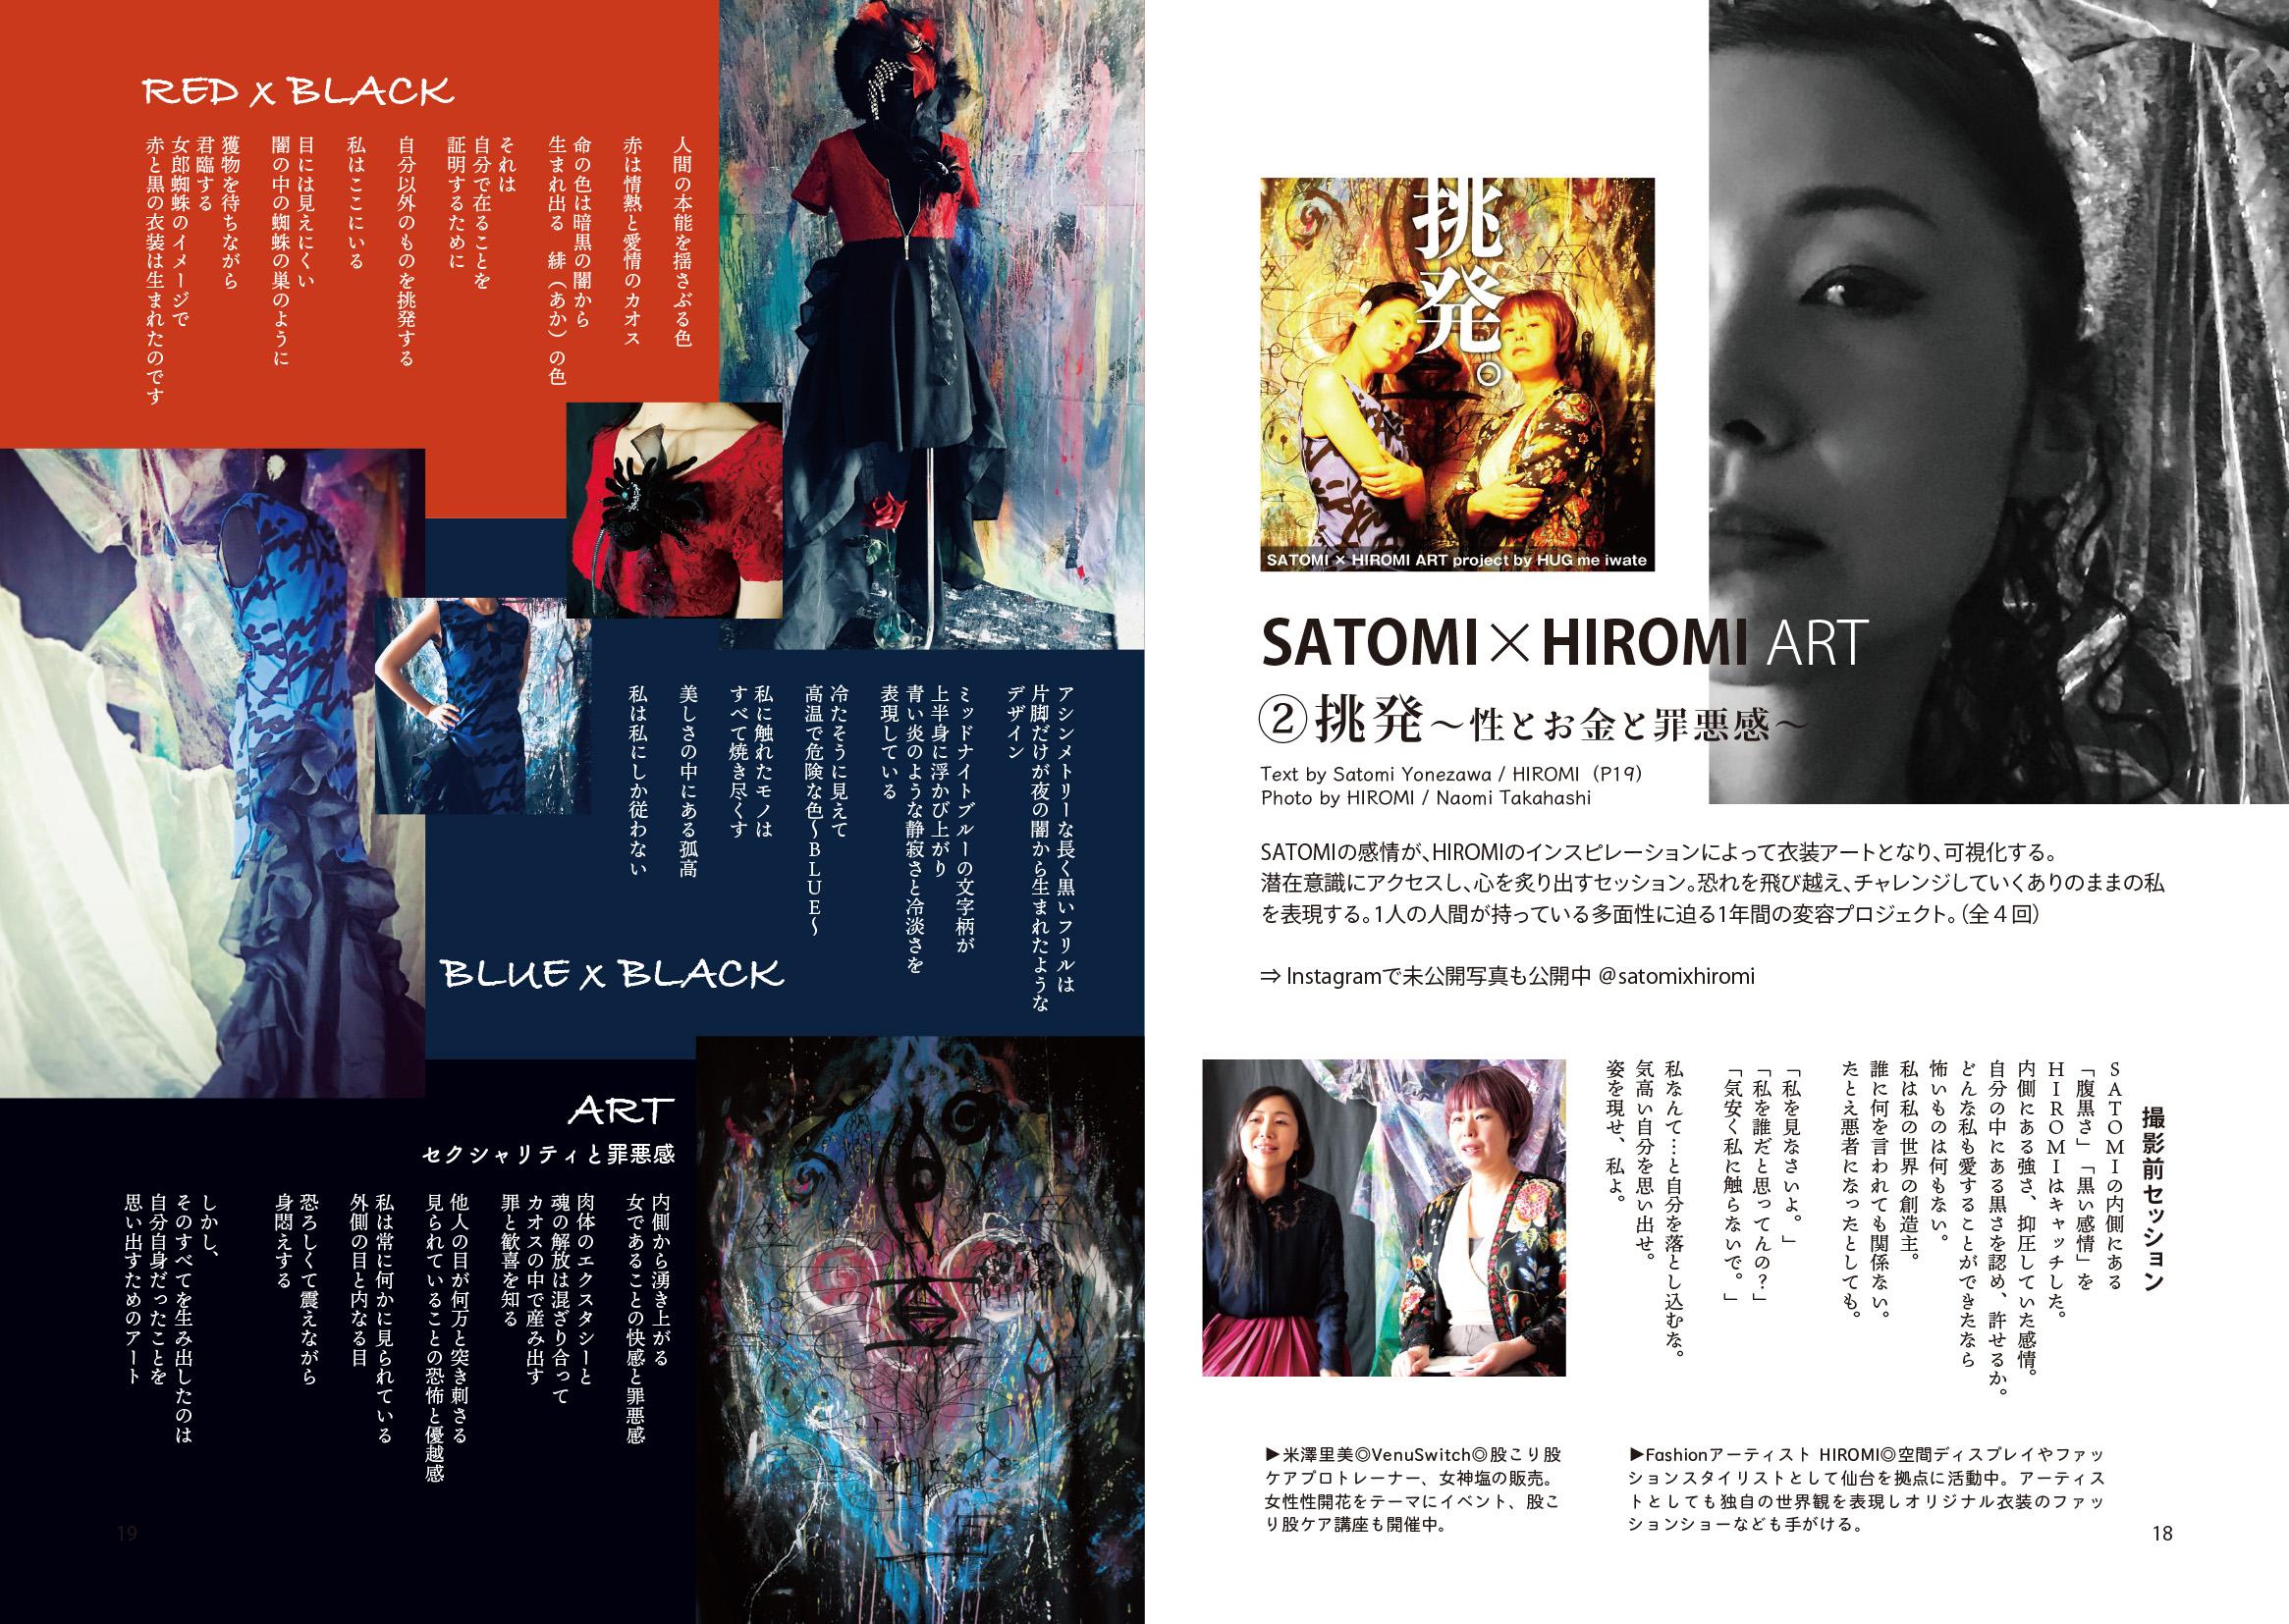 SATOMI x HIROMI ART 今回は「挑発」